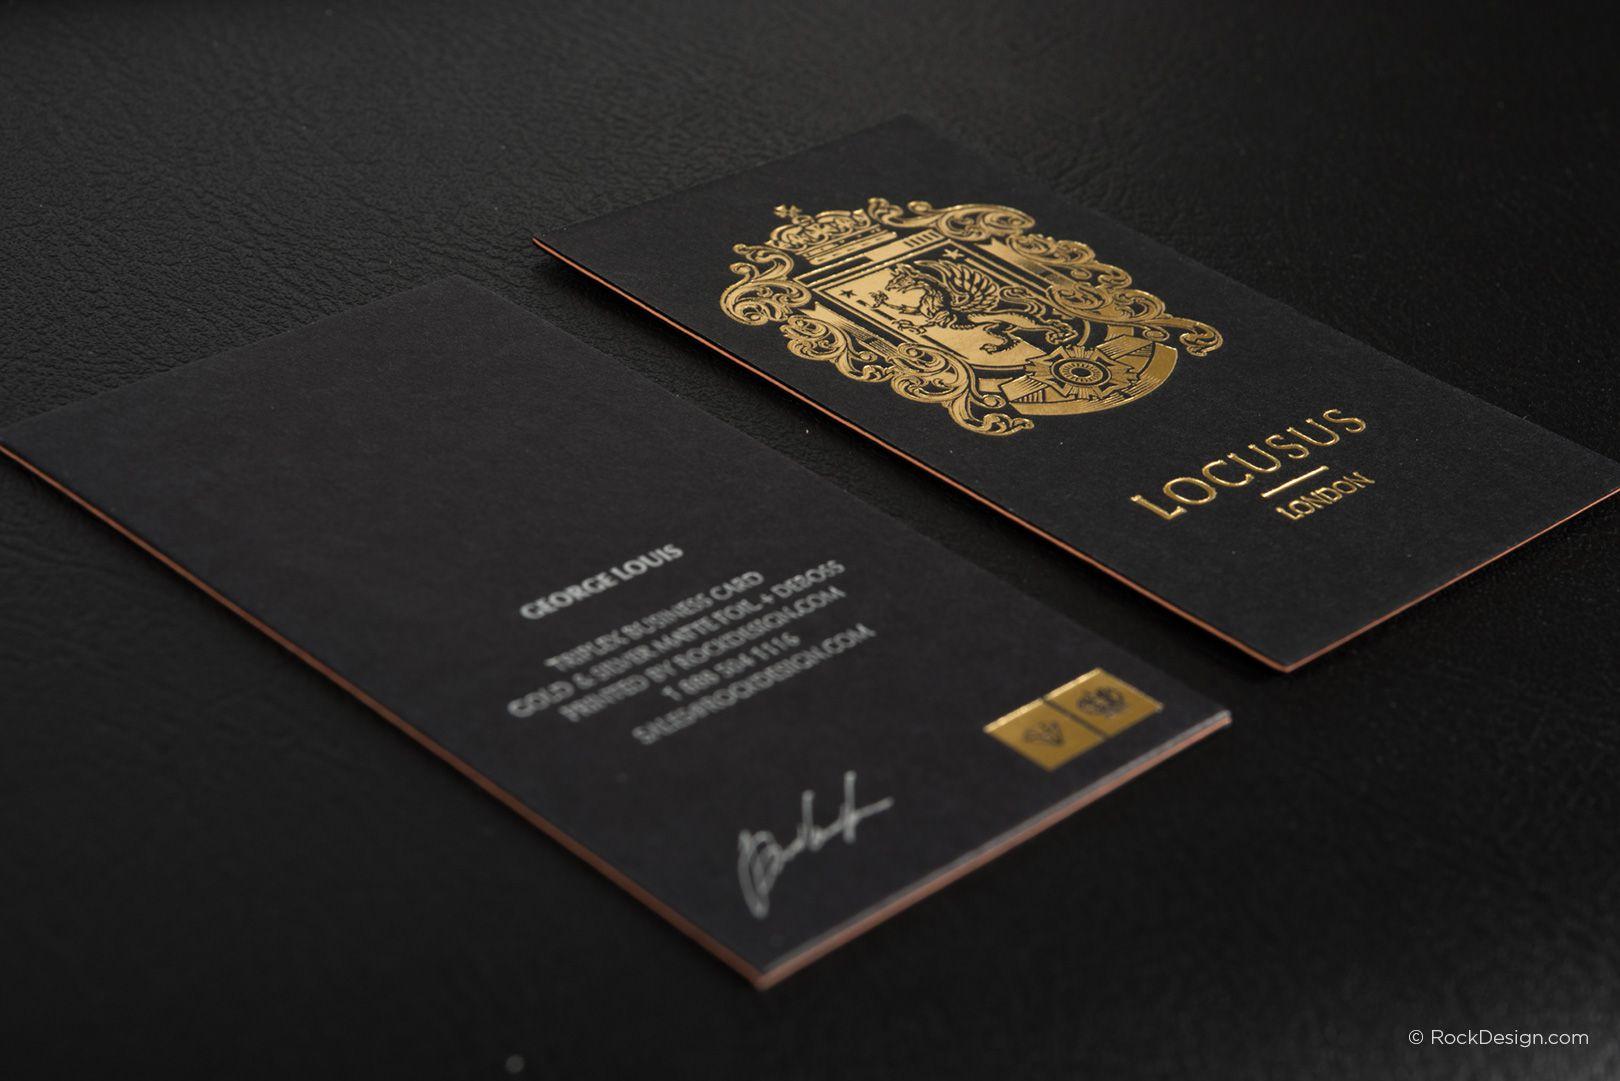 Triplex business cards rockdesign luxury business card printing triplex business cards rockdesign luxury business card printing colourmoves